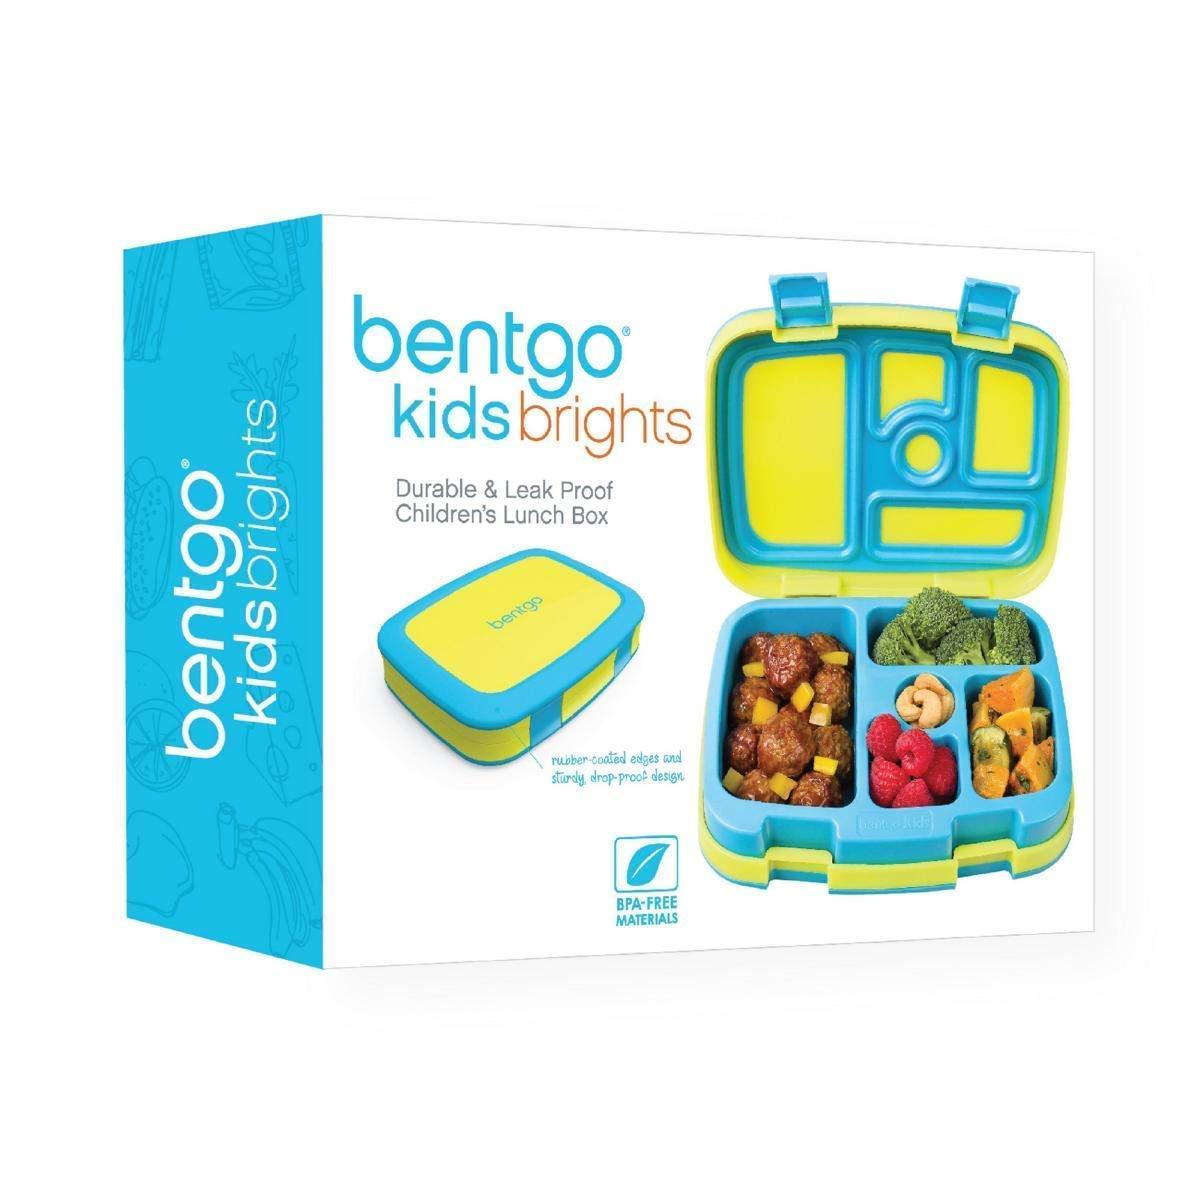 Bentgo Salate Brotdose Bentgo Box Lunchbox mit Besteck Kinder Box Bentobox